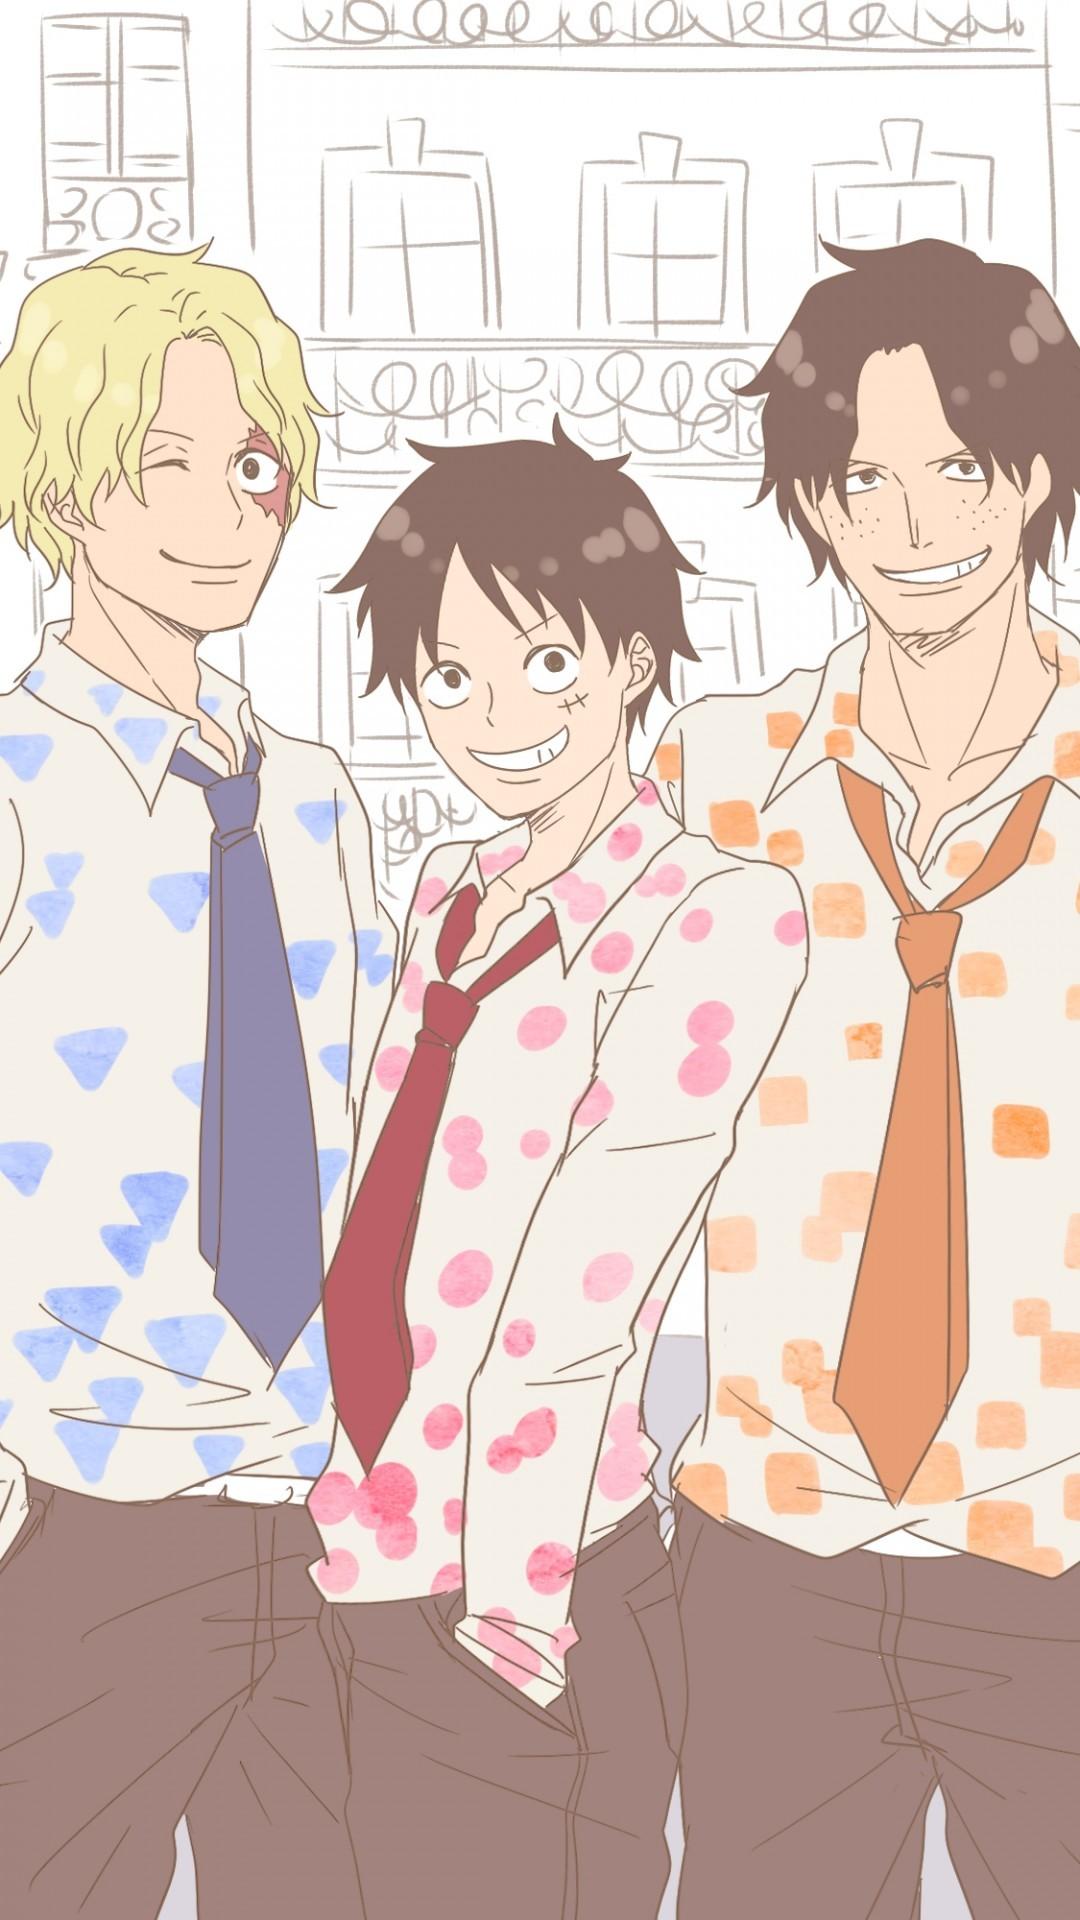 Luffy Zoro Sanji Friends One Piece Cartoon 1080x1920 Wallpaper Teahub Io